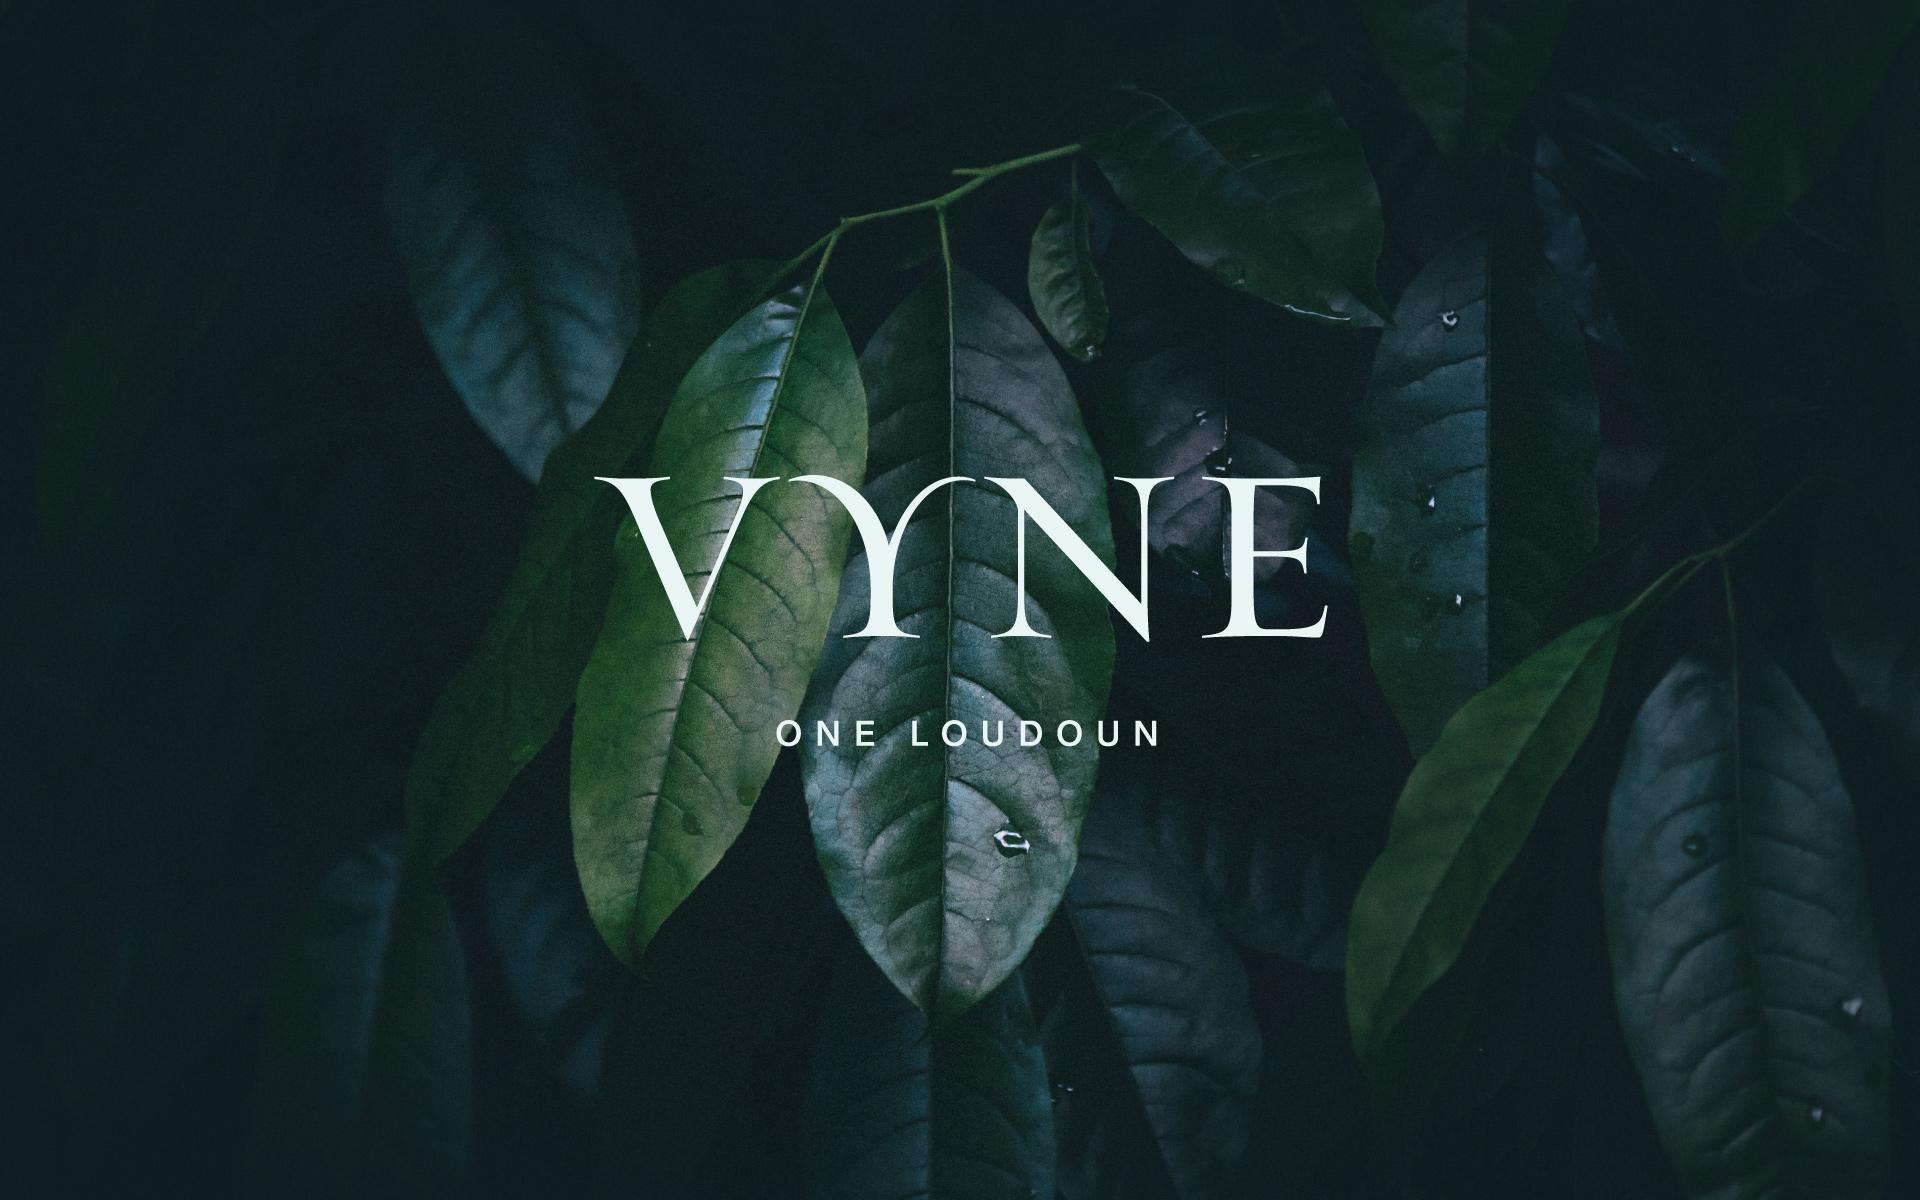 Vyne One Loudoun